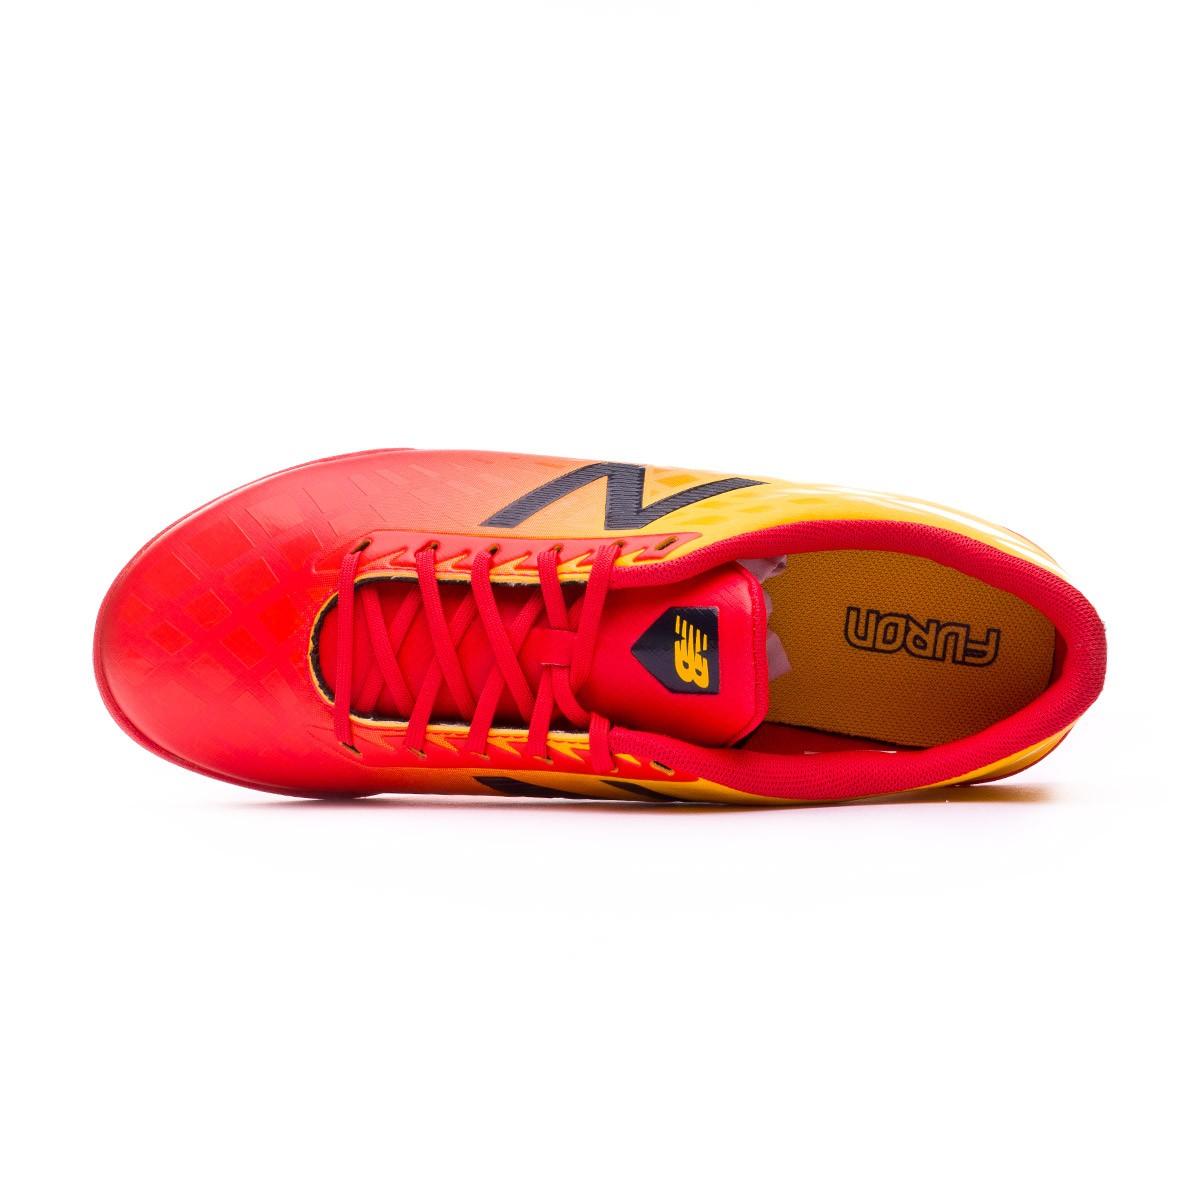 d79d43dac Futsal Boot New Balance Kids Furon 4.0 Dispatch Indoor Flame - Football  store Fútbol Emotion